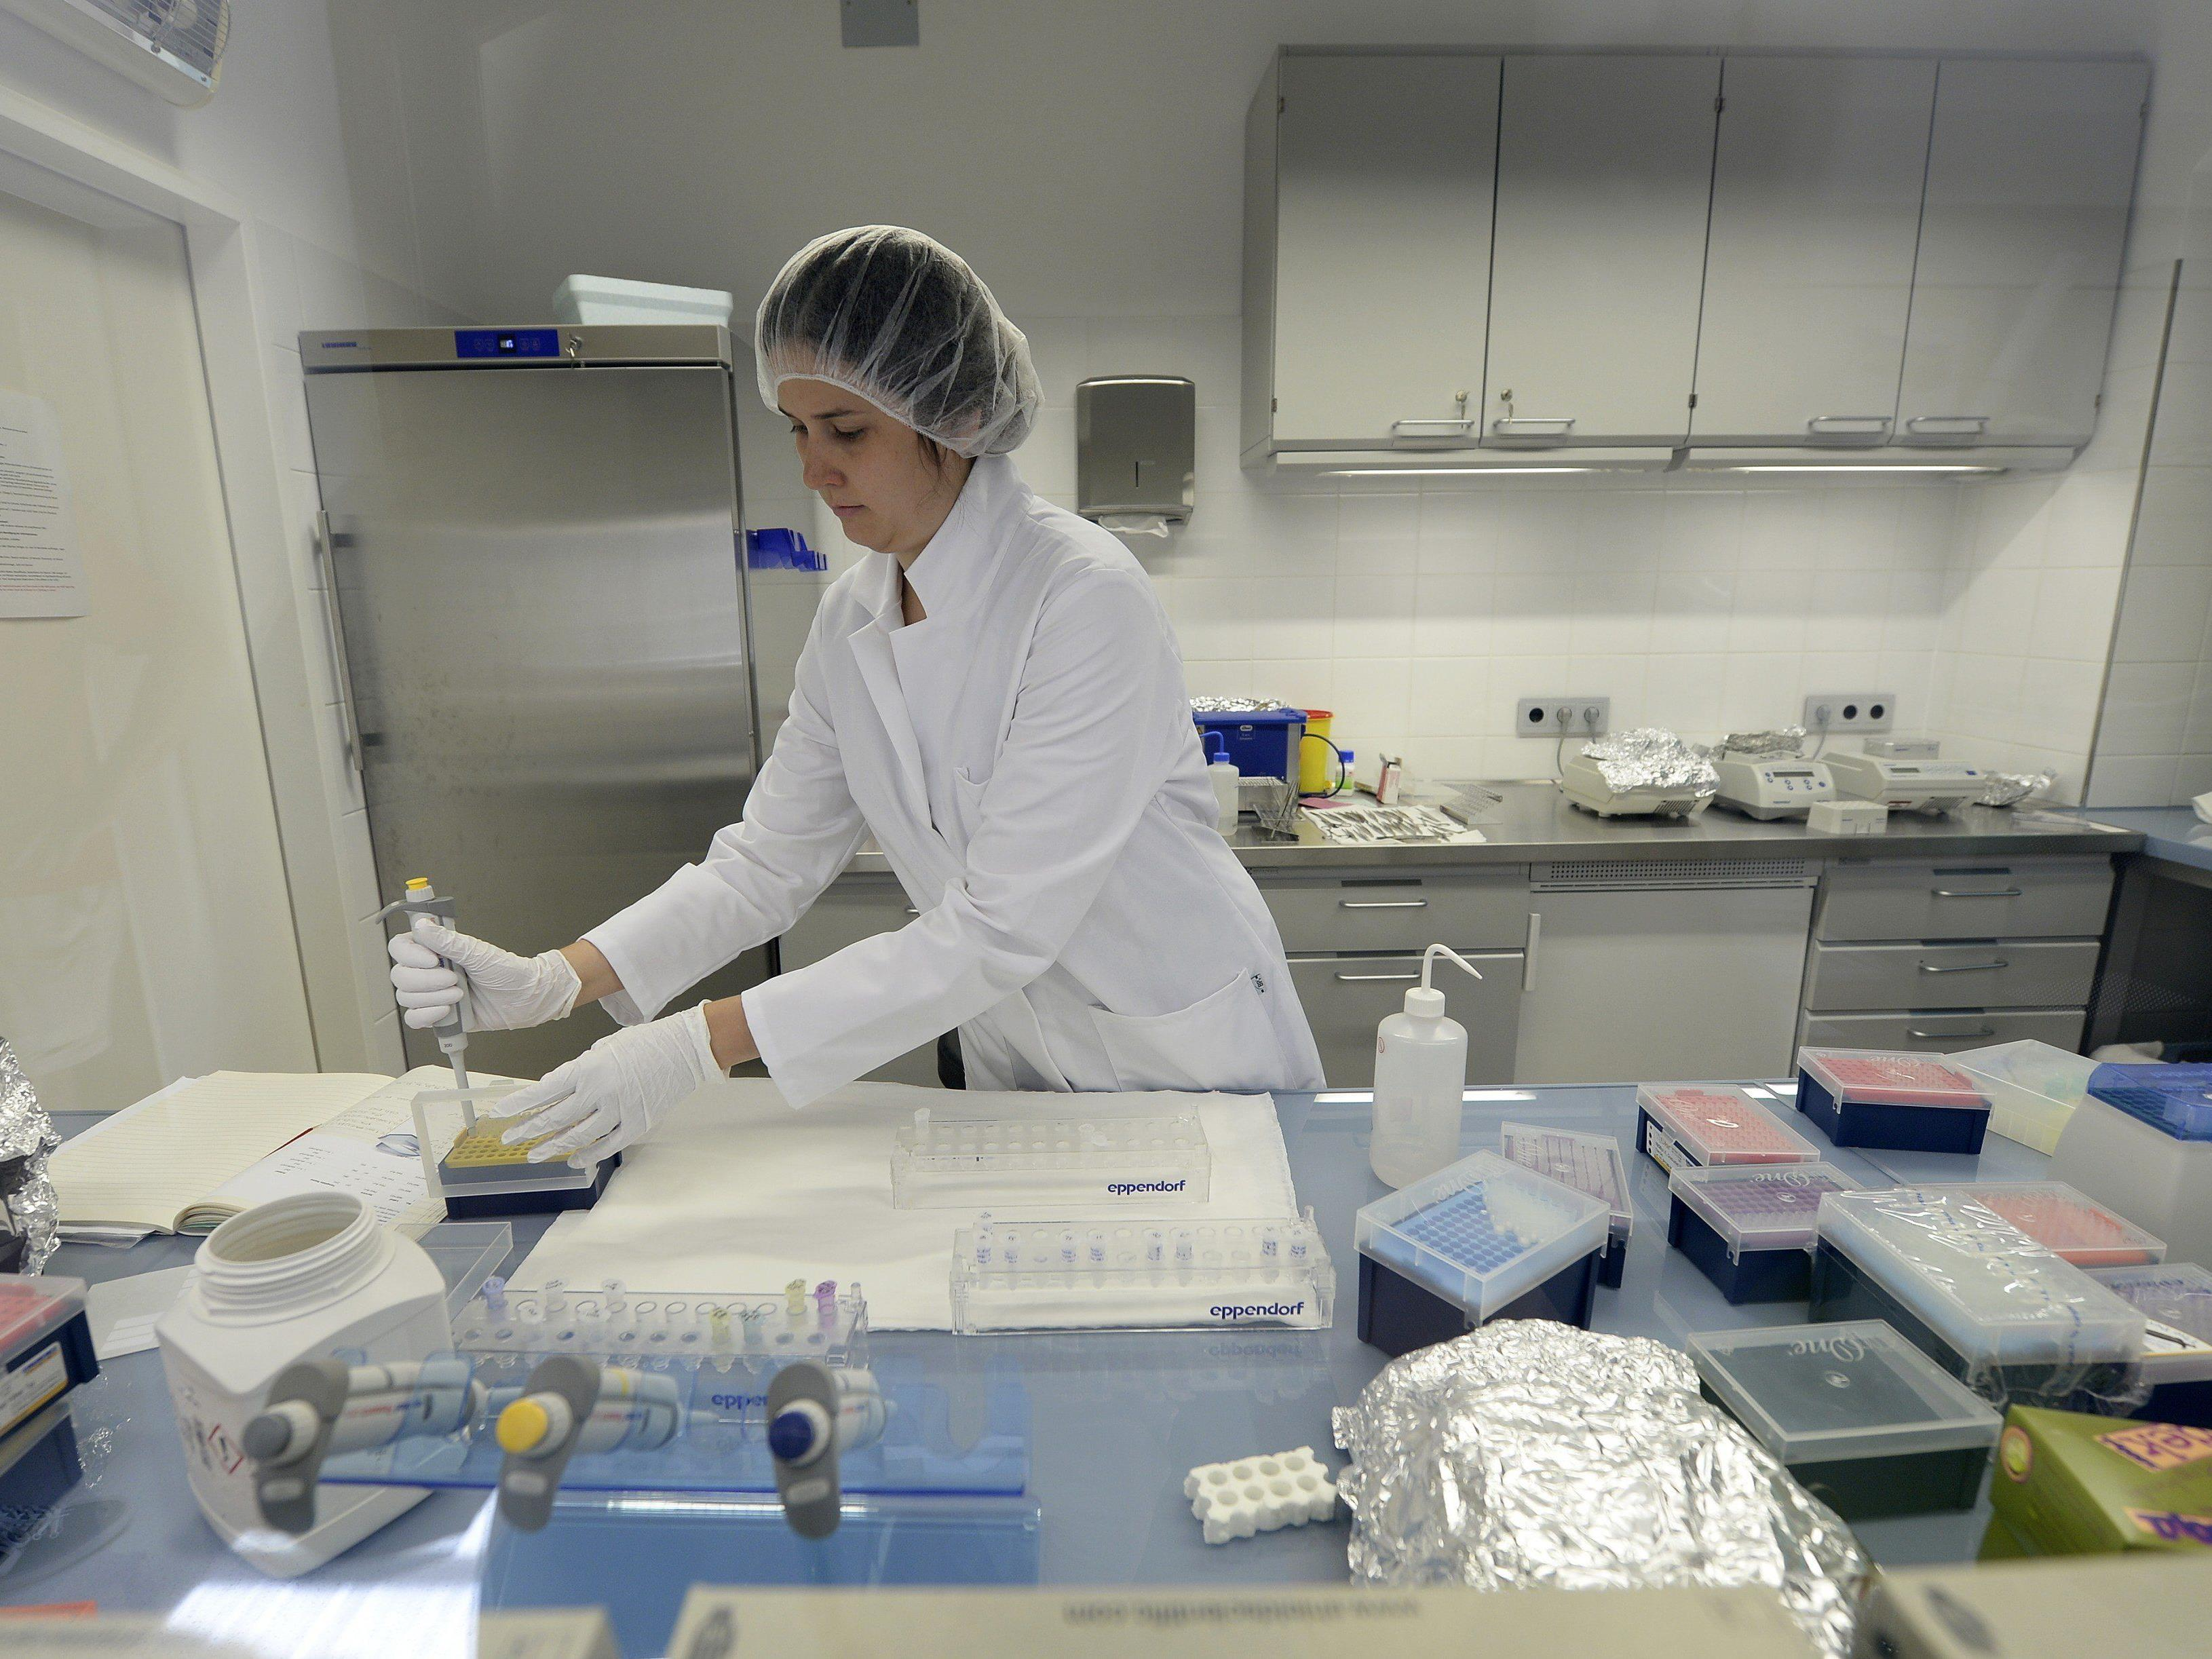 Krebsmedikament zähmt wildgewordene Riesenfresszellen.